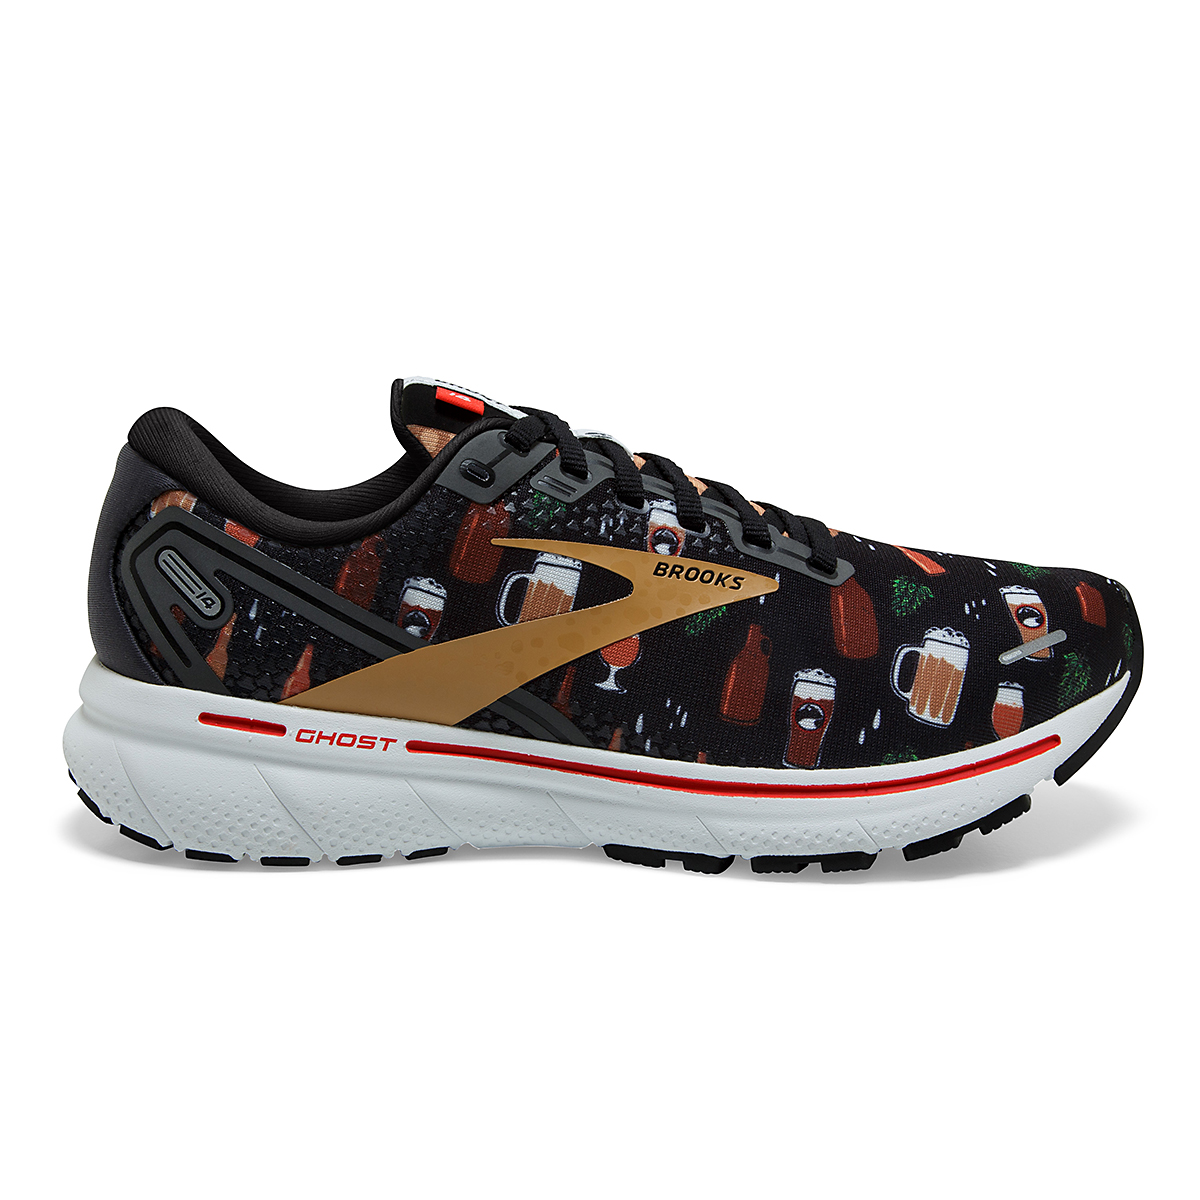 Women's Brooks Ghost 14 Running Shoe - Color: Run Hoppy - Size: 5 - Width: Regular, Run Hoppy, large, image 1